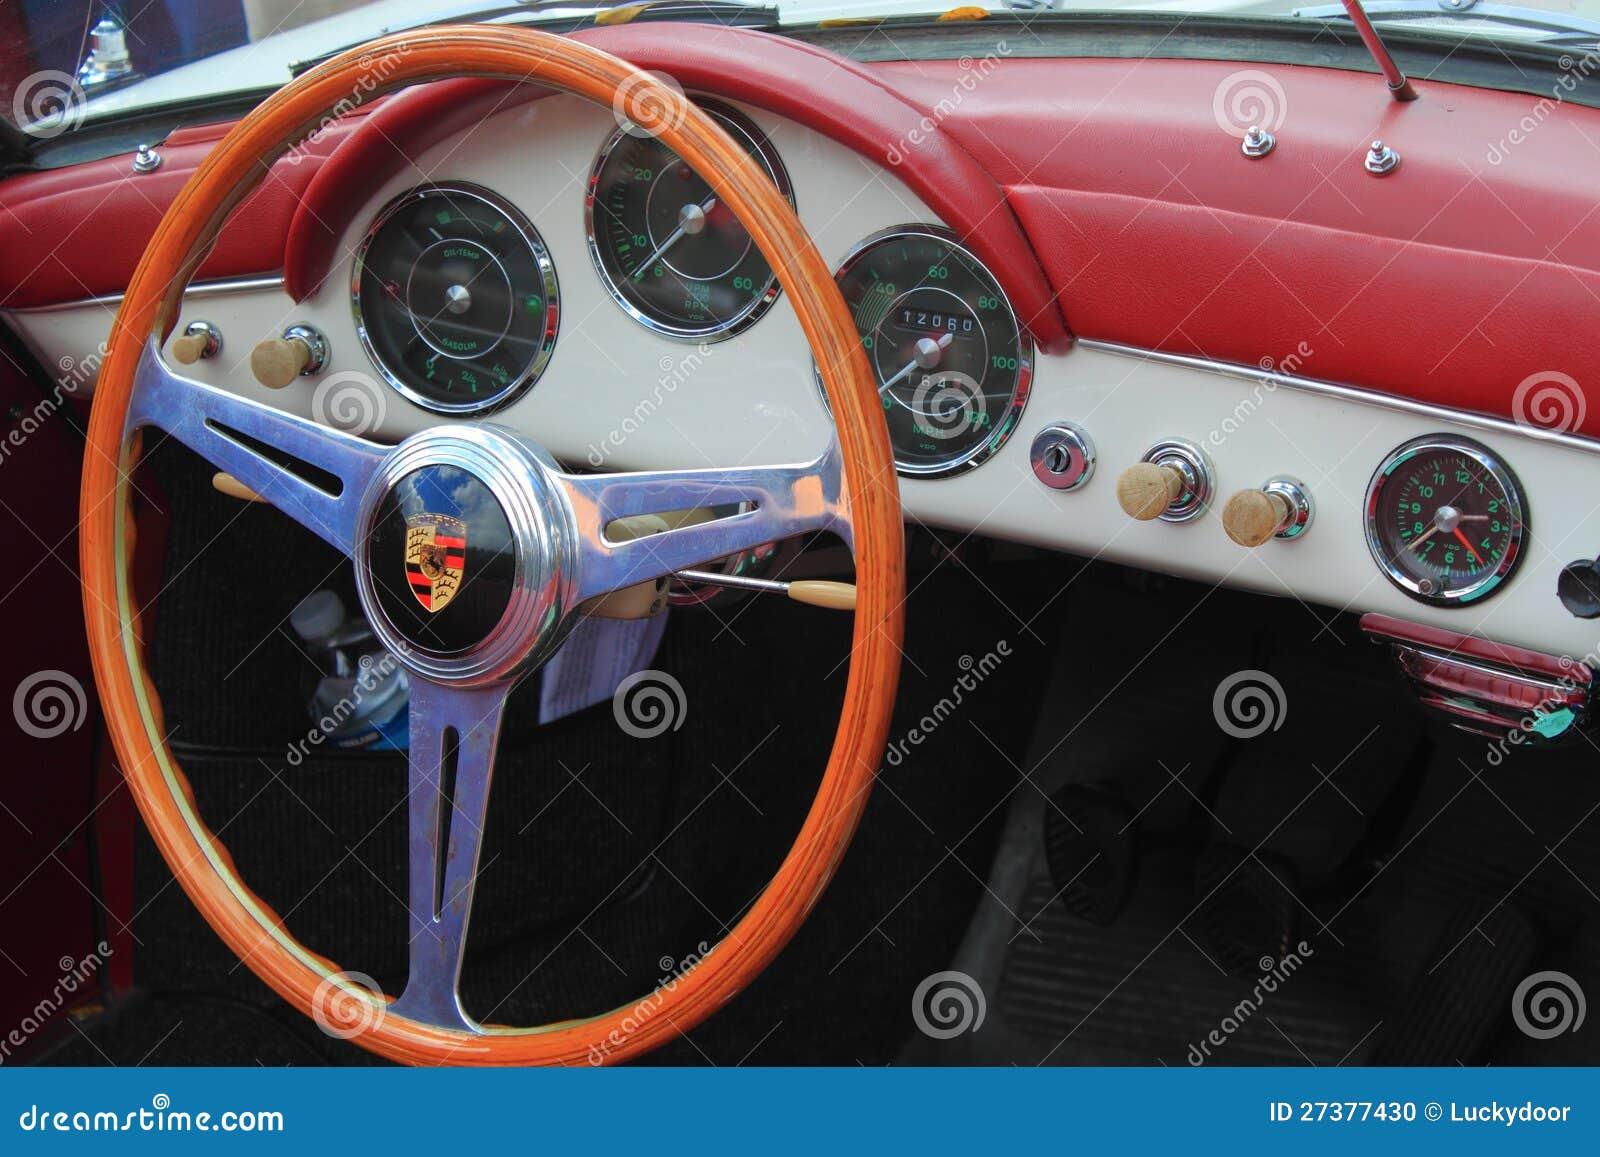 antique porsche car interior editorial image 27377430. Black Bedroom Furniture Sets. Home Design Ideas